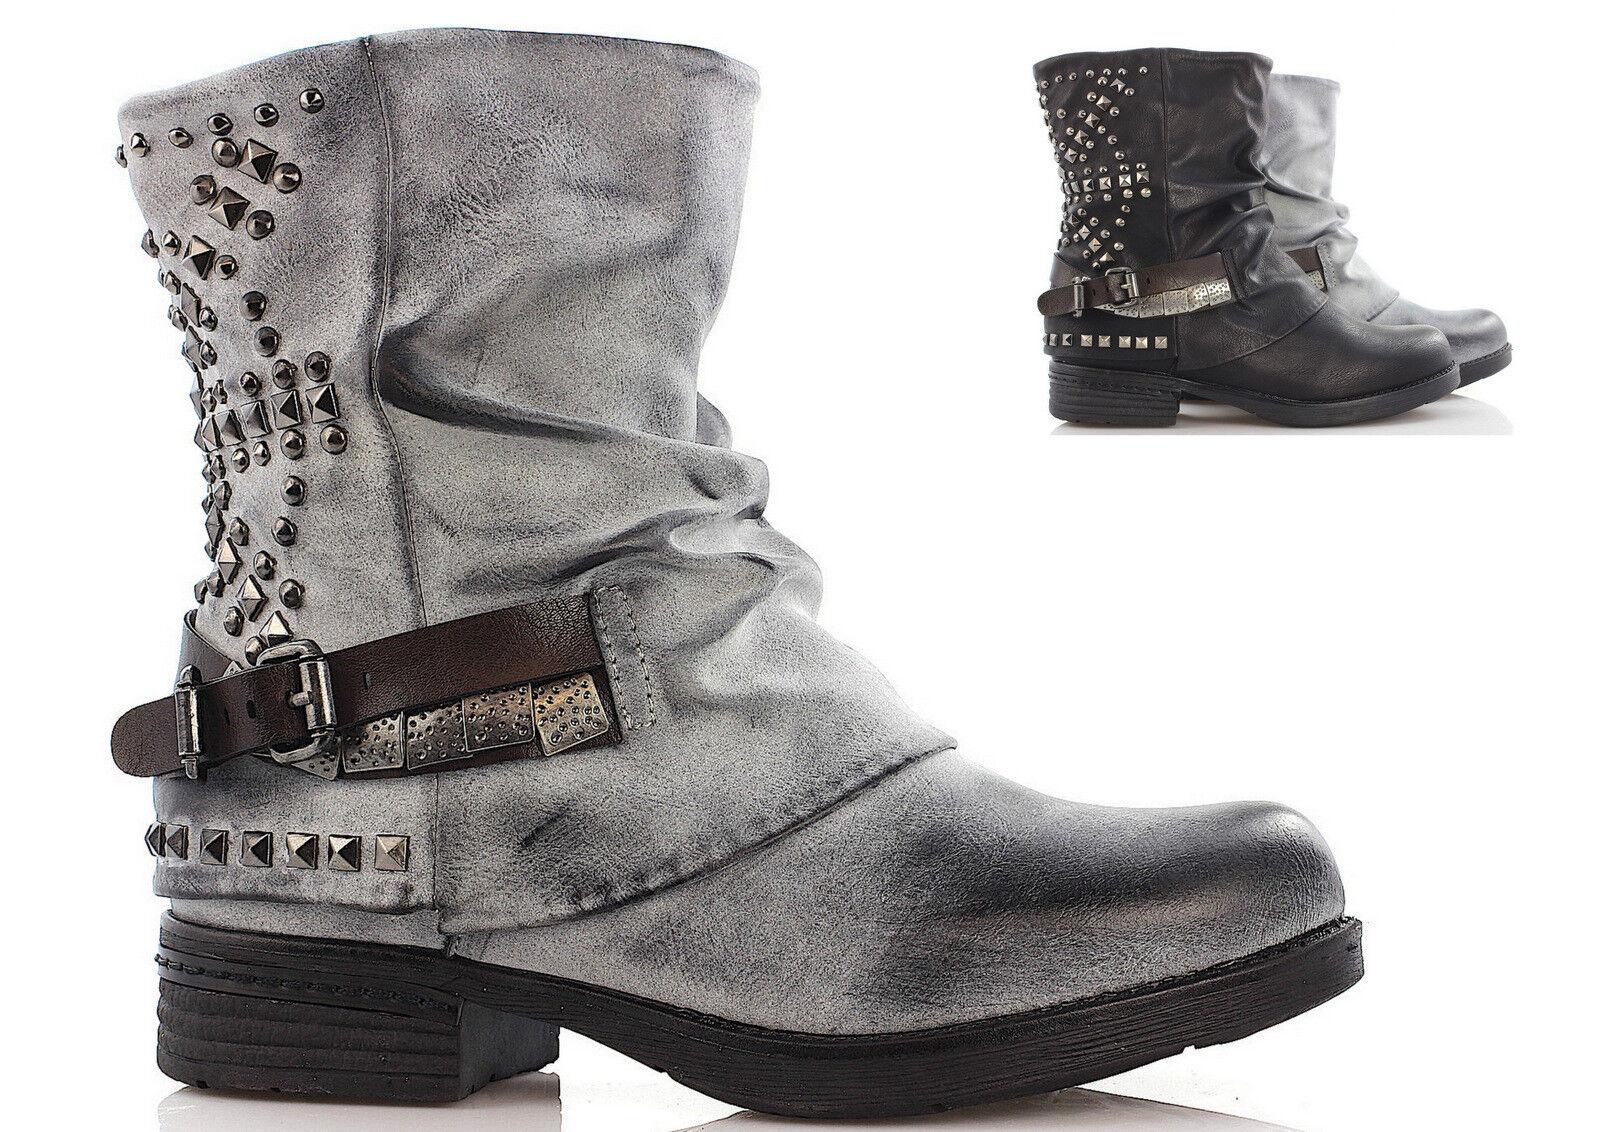 Ladies Ankle Boots Biker Boots Flat Winter shoes Rivets Ladies Boots